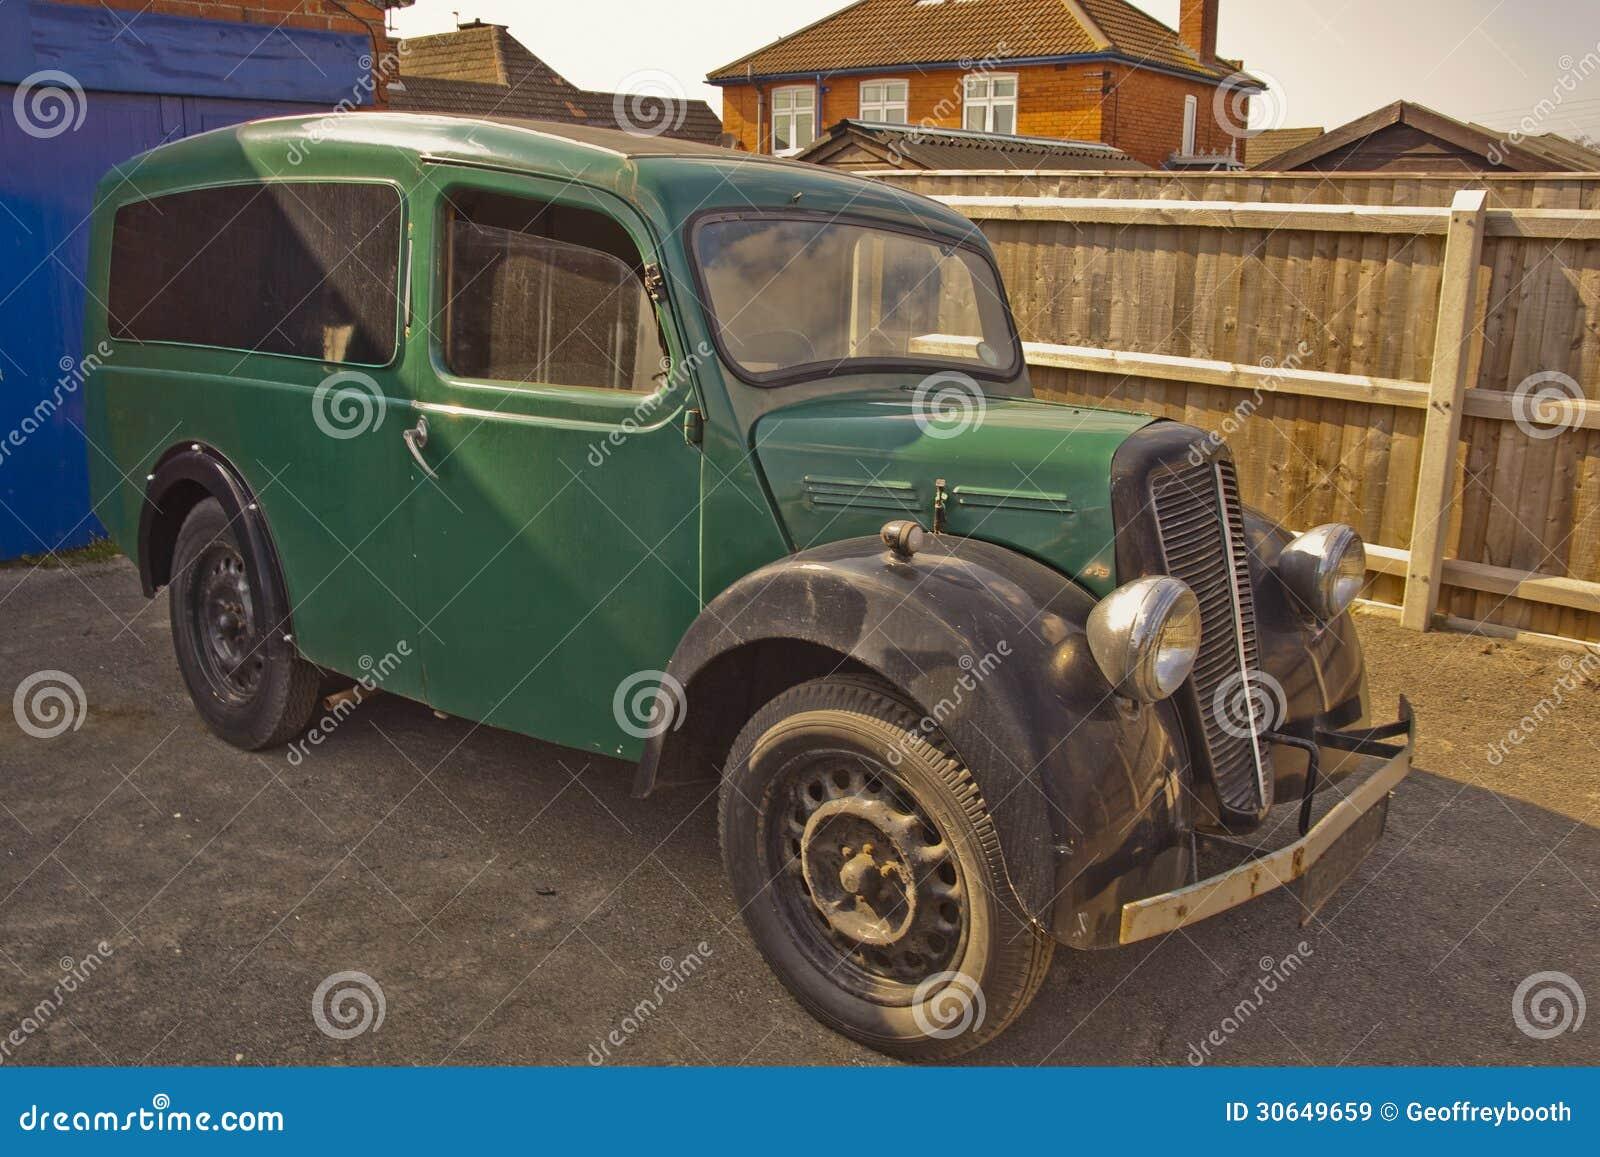 A Rare Find, Old Morris Delivery Van.